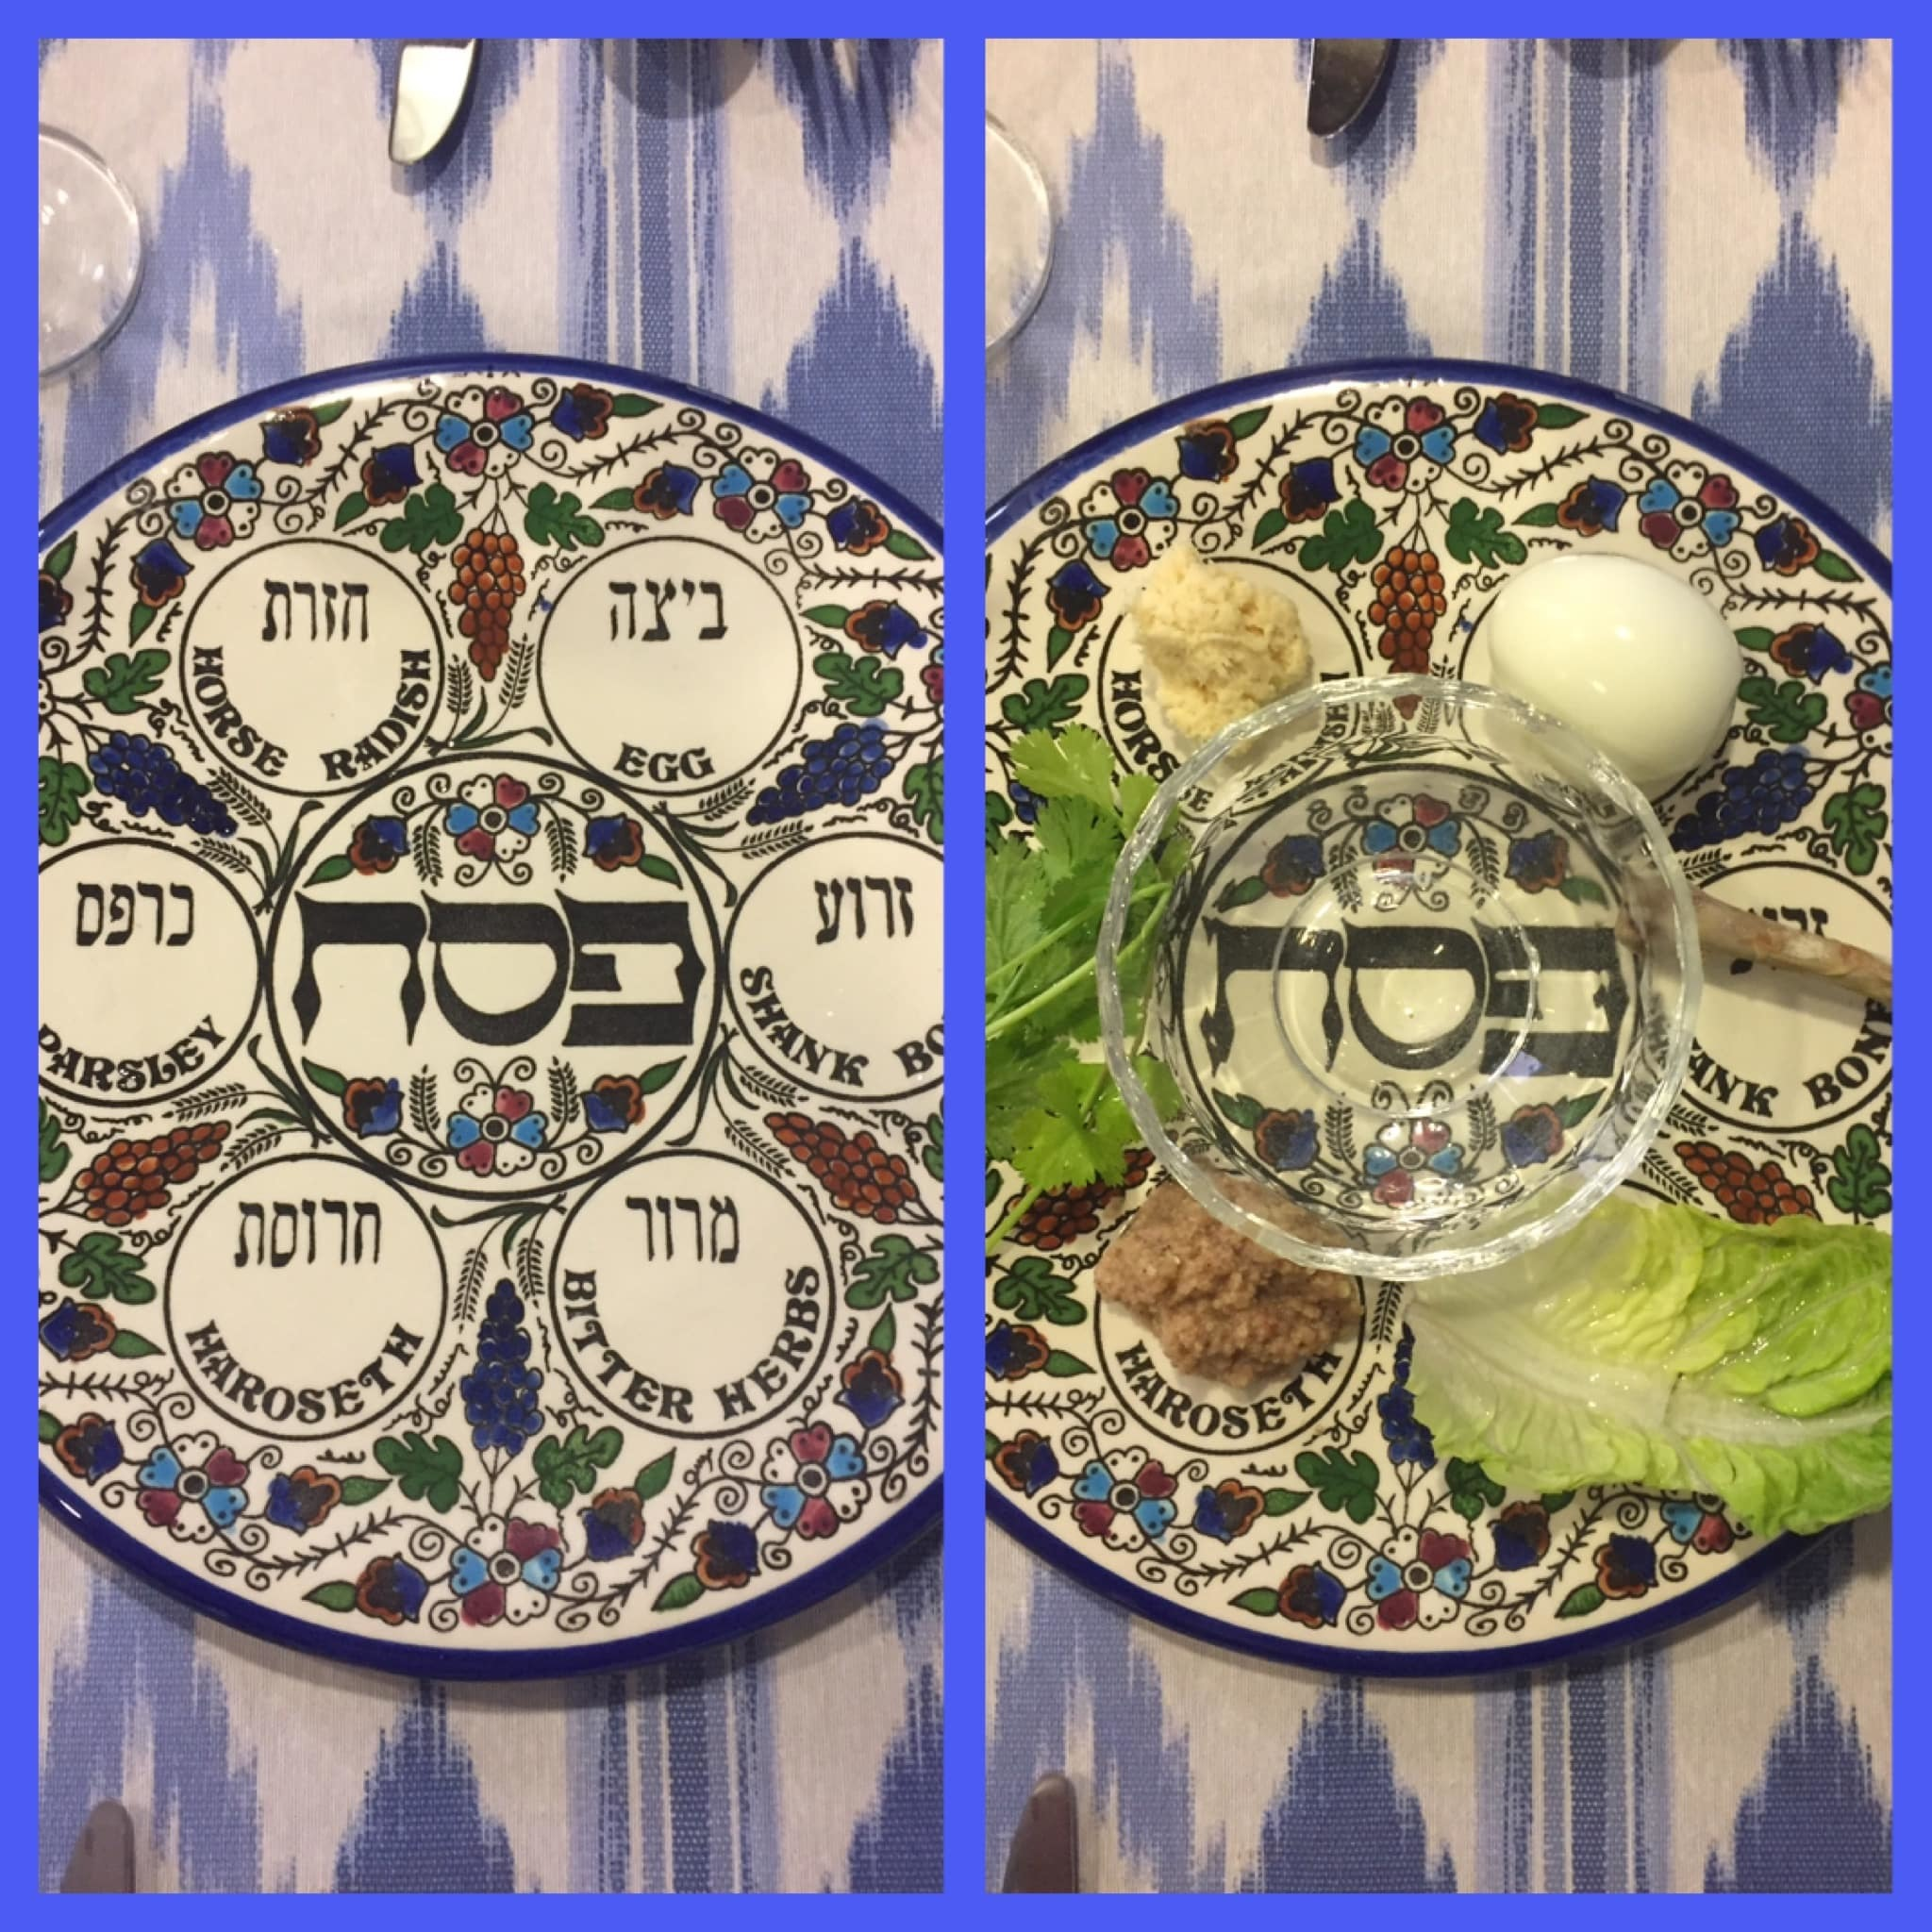 Passover Jewish Celebration IMG 0544 min